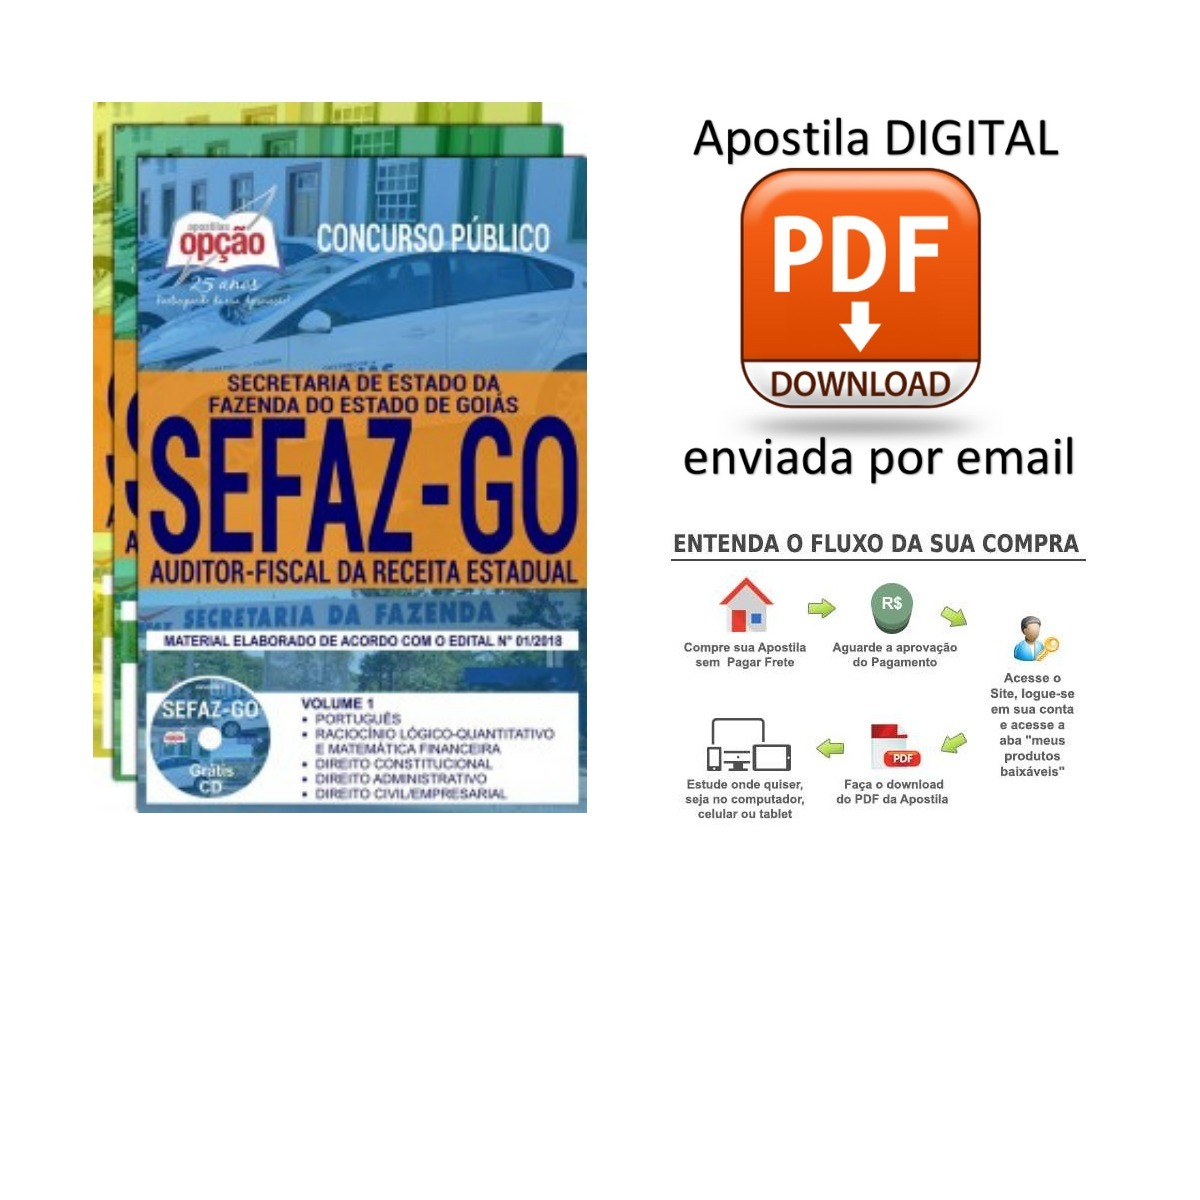 Apostila Auditor Fiscal Da Receita Federal Pdf Download